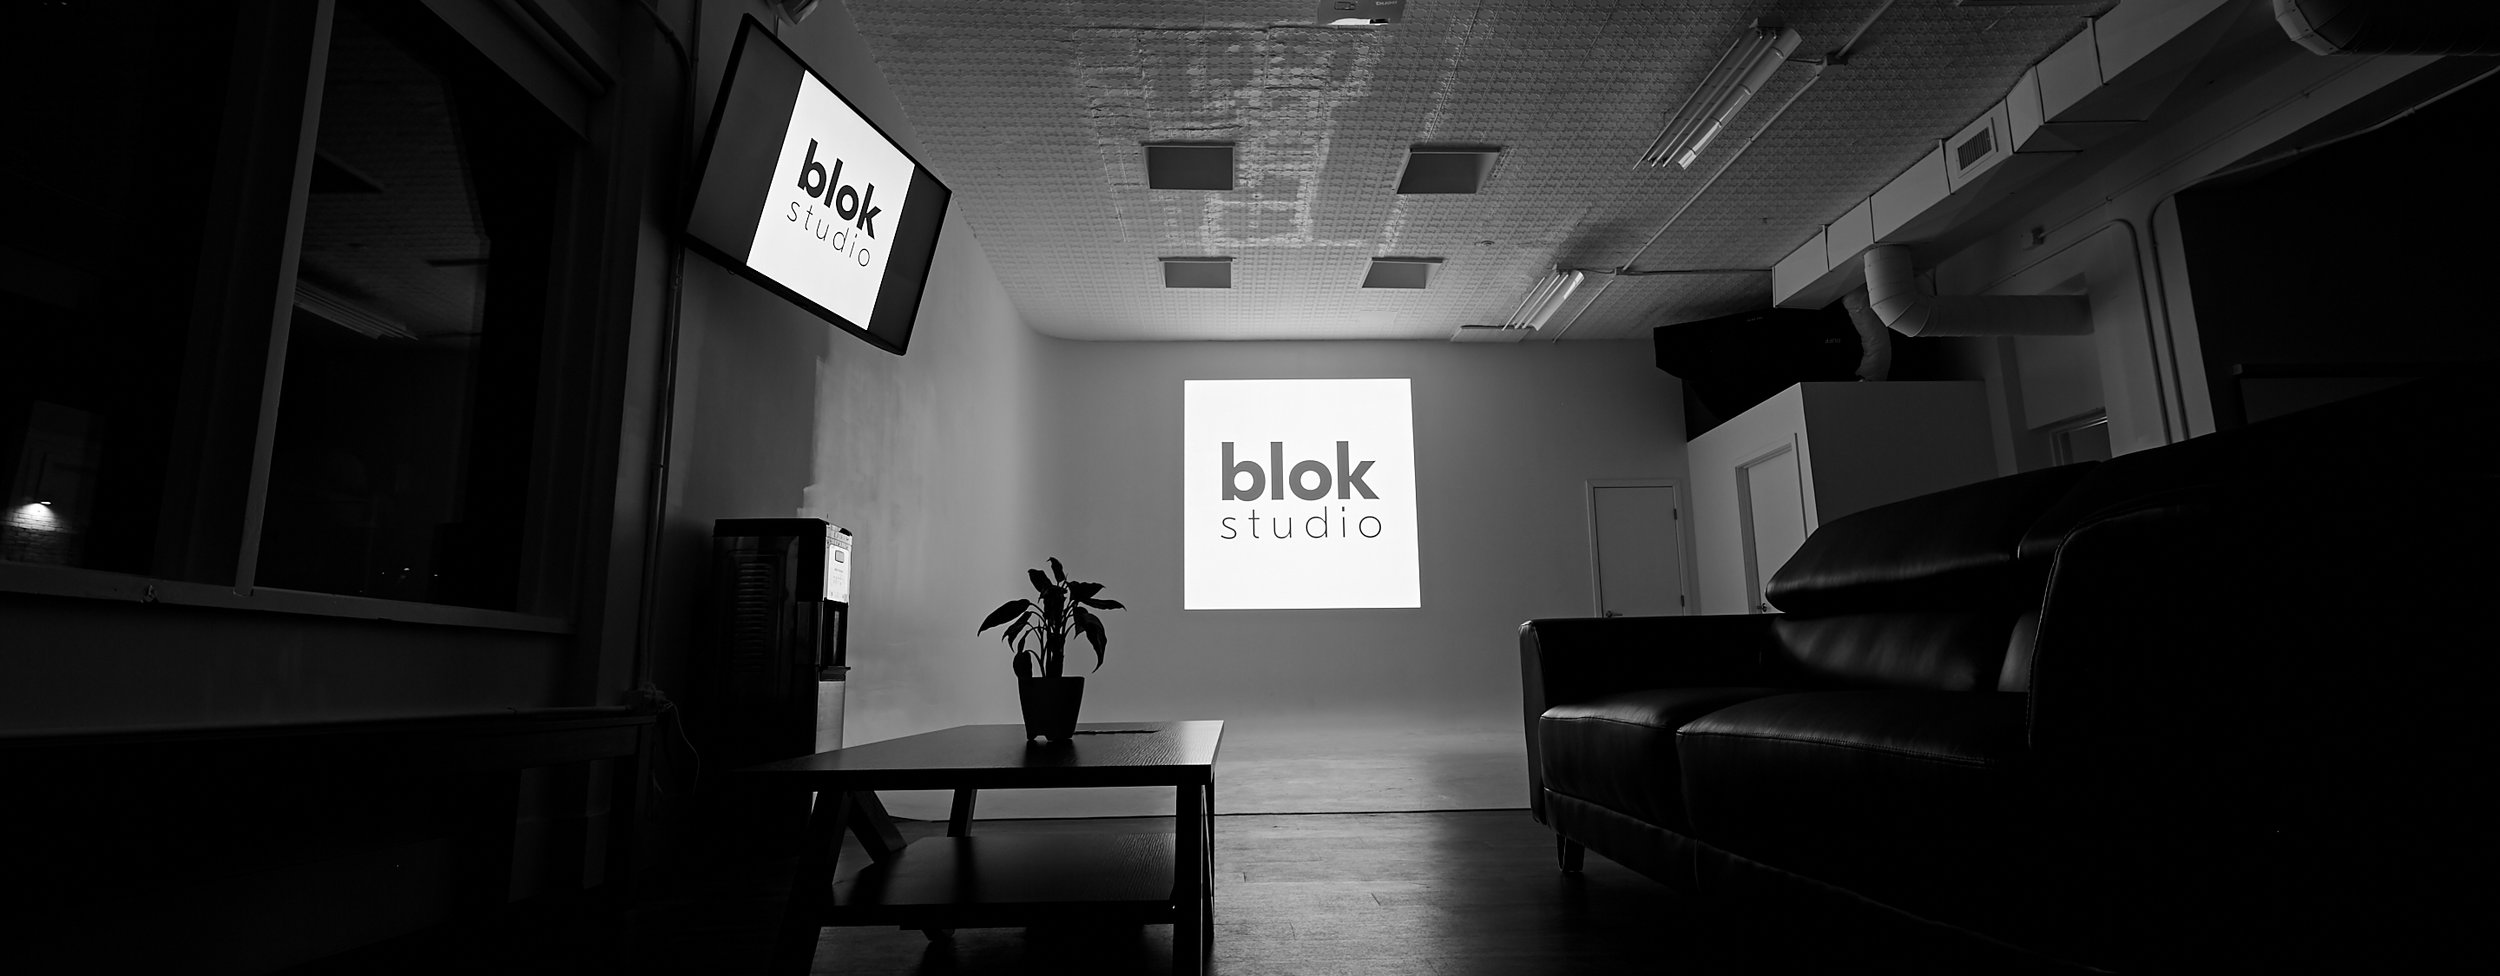 Phoenix_Blok_Studio-8.jpg